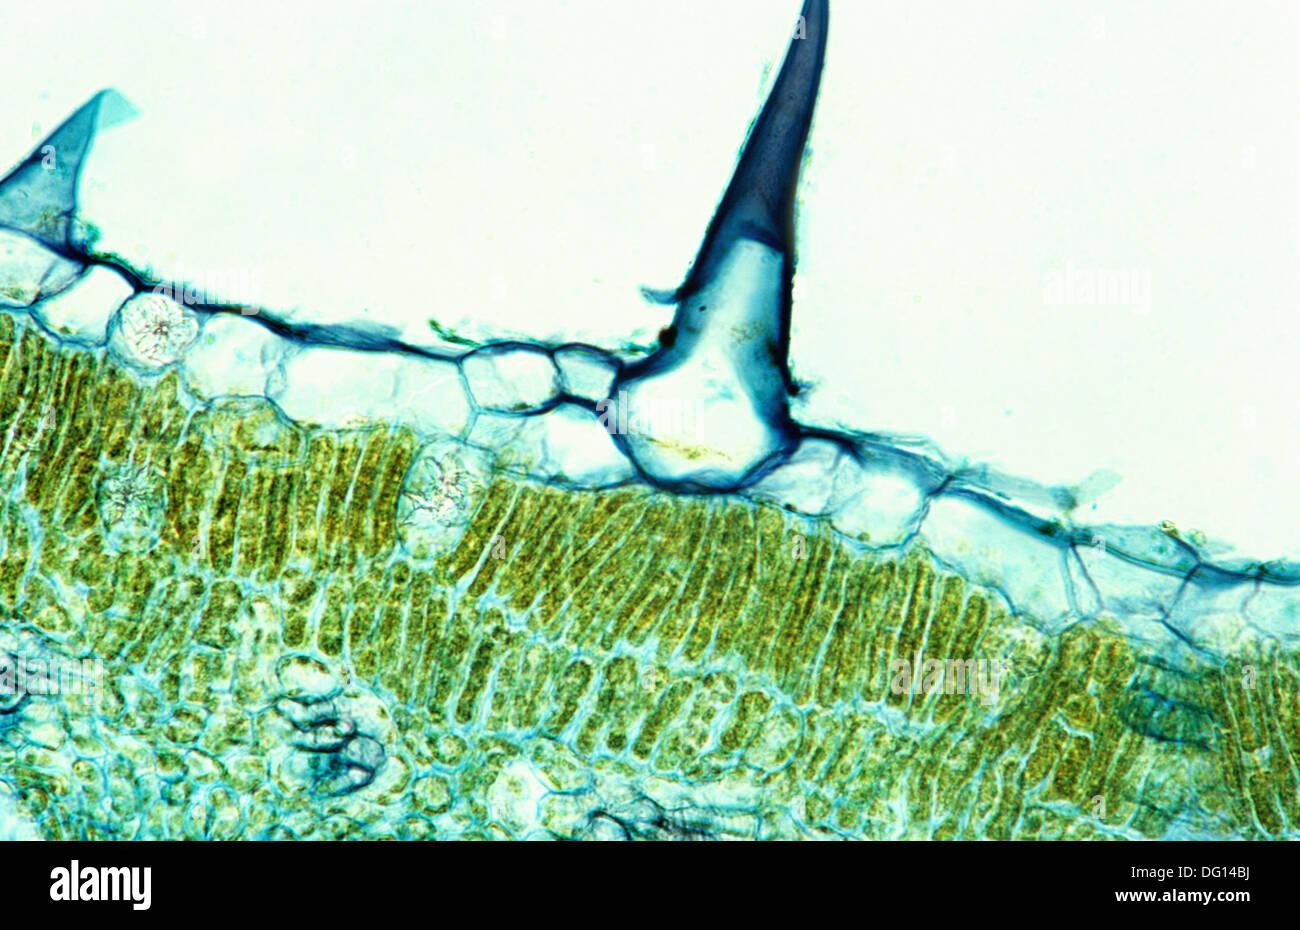 Hoja de ficus elastica, Moraceae, tricoma, 400 x Microscopio óptico ...